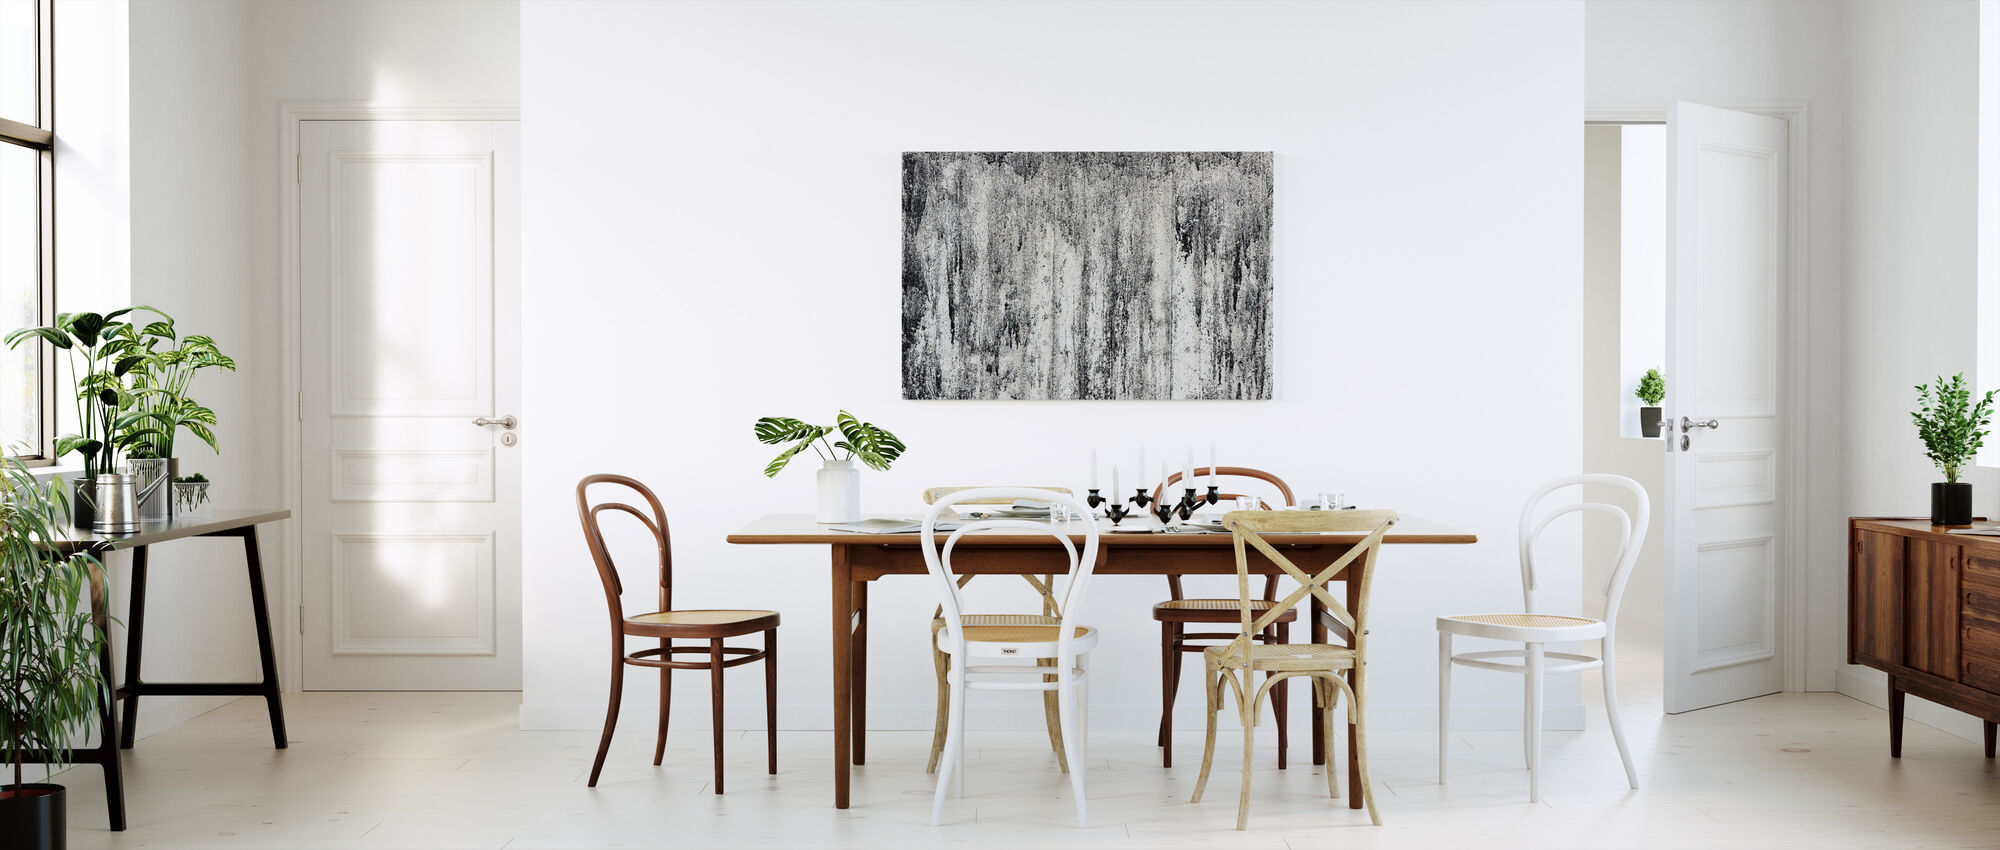 Zwarte Cement Muur - Canvas print - Keuken